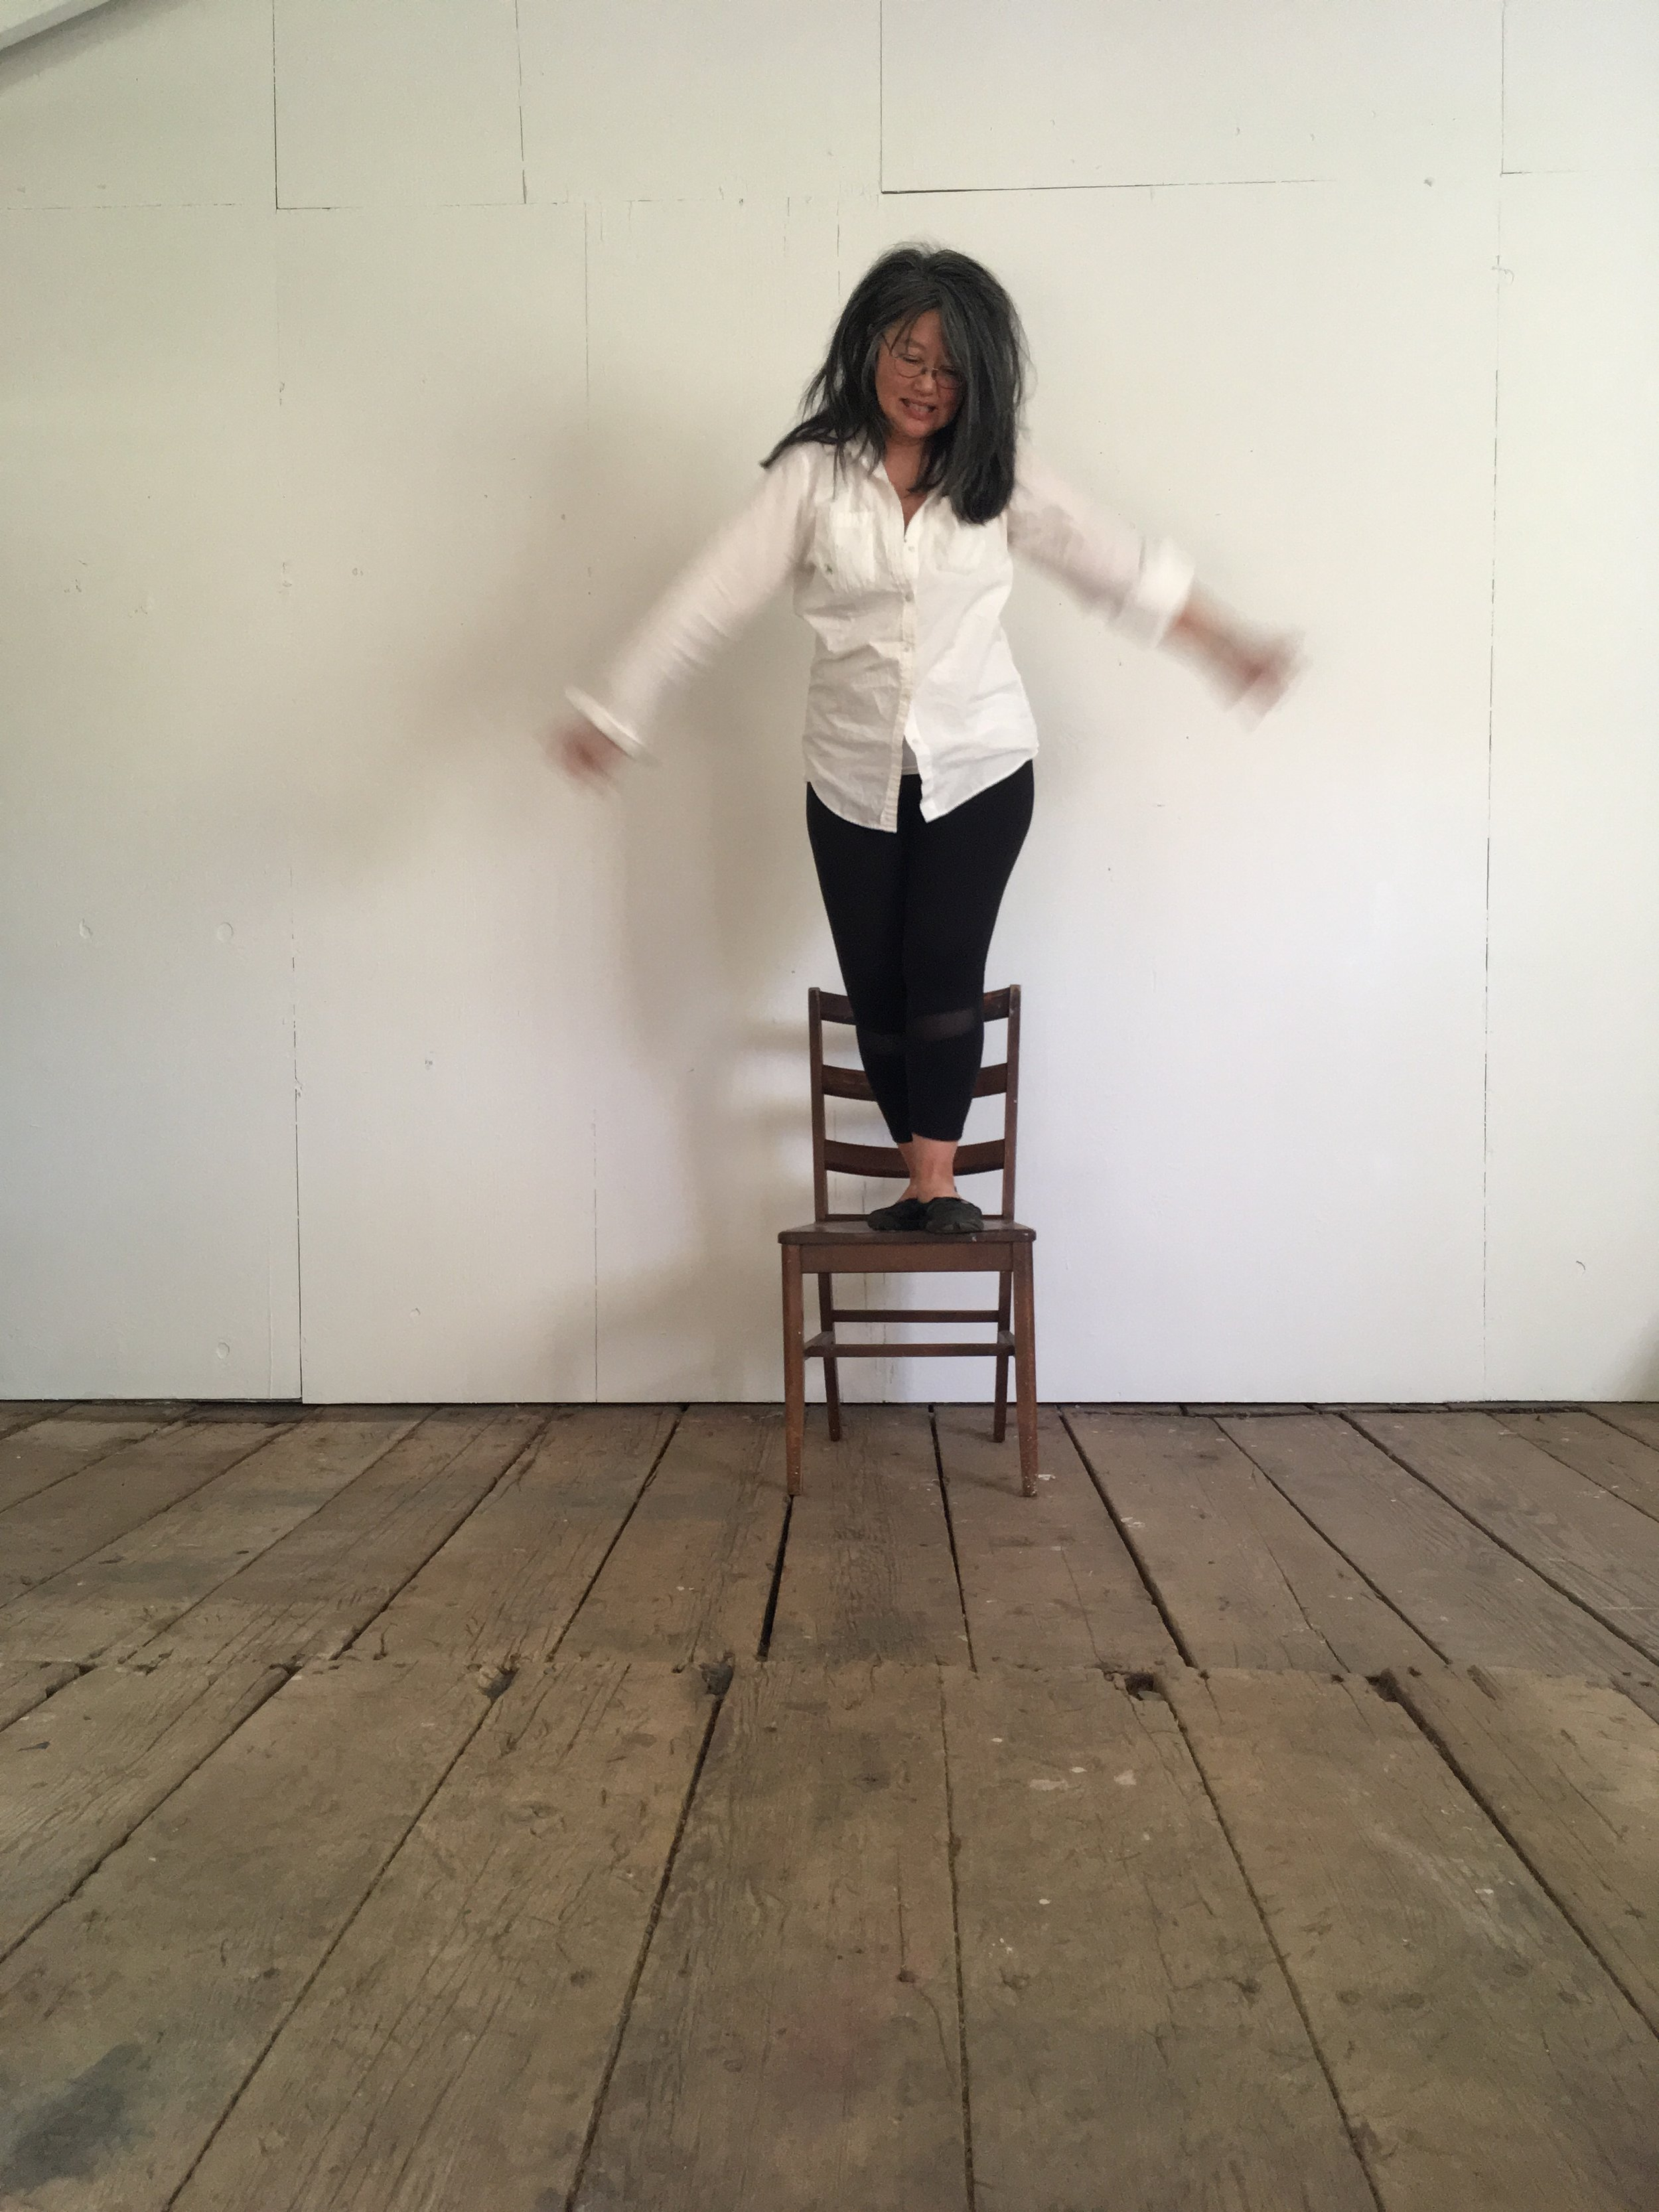 PHOTO chalk hill - studio - jumping 4.JPG